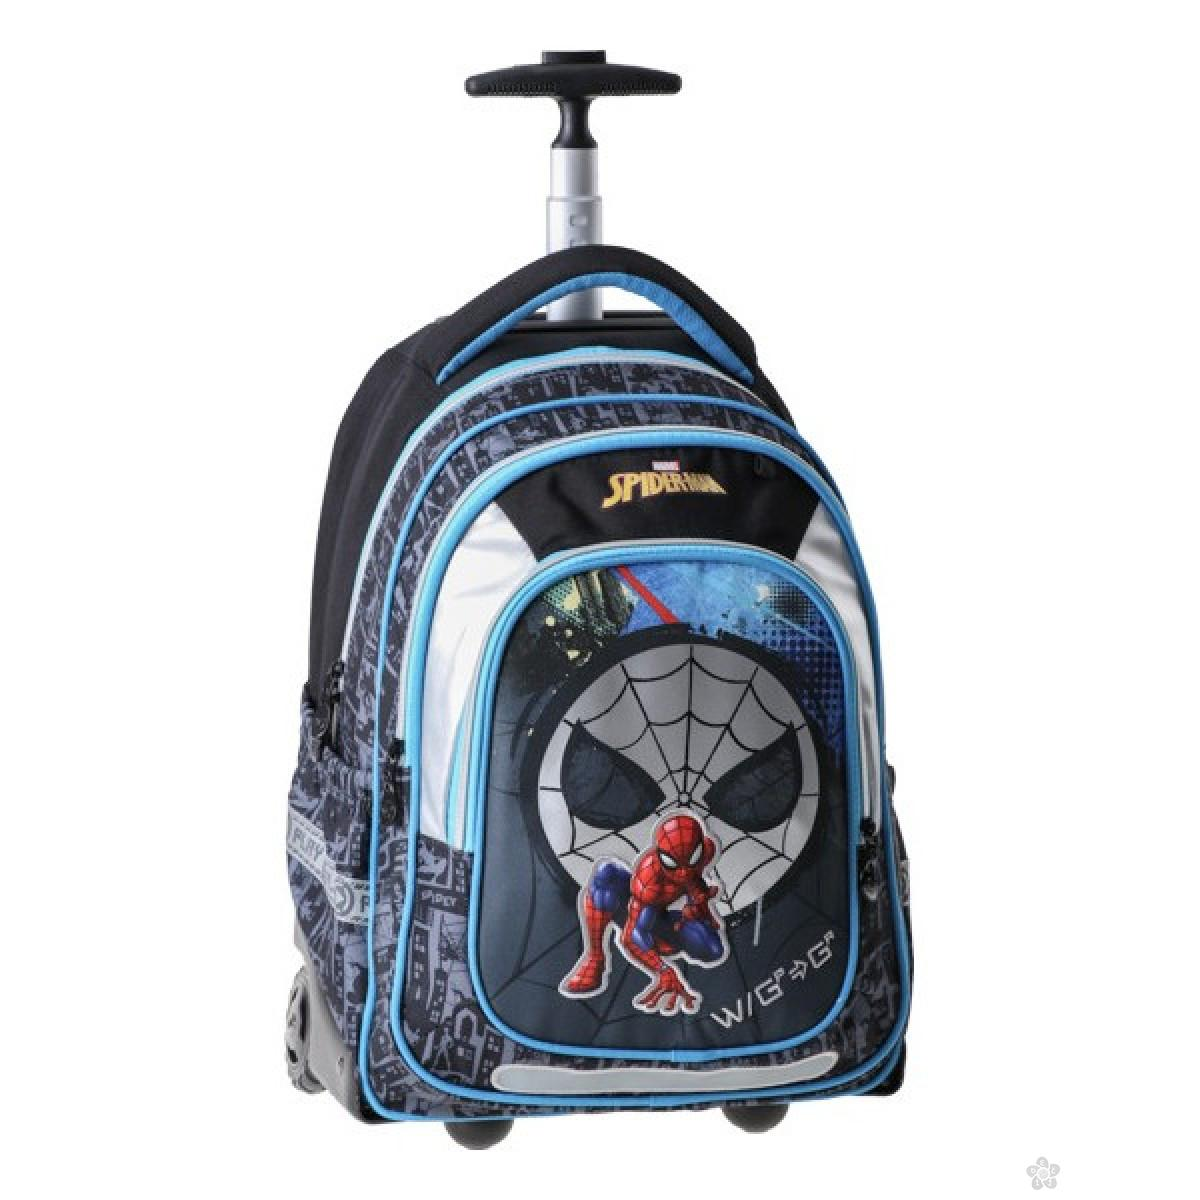 Ranac na točkiće Spiderman 326001